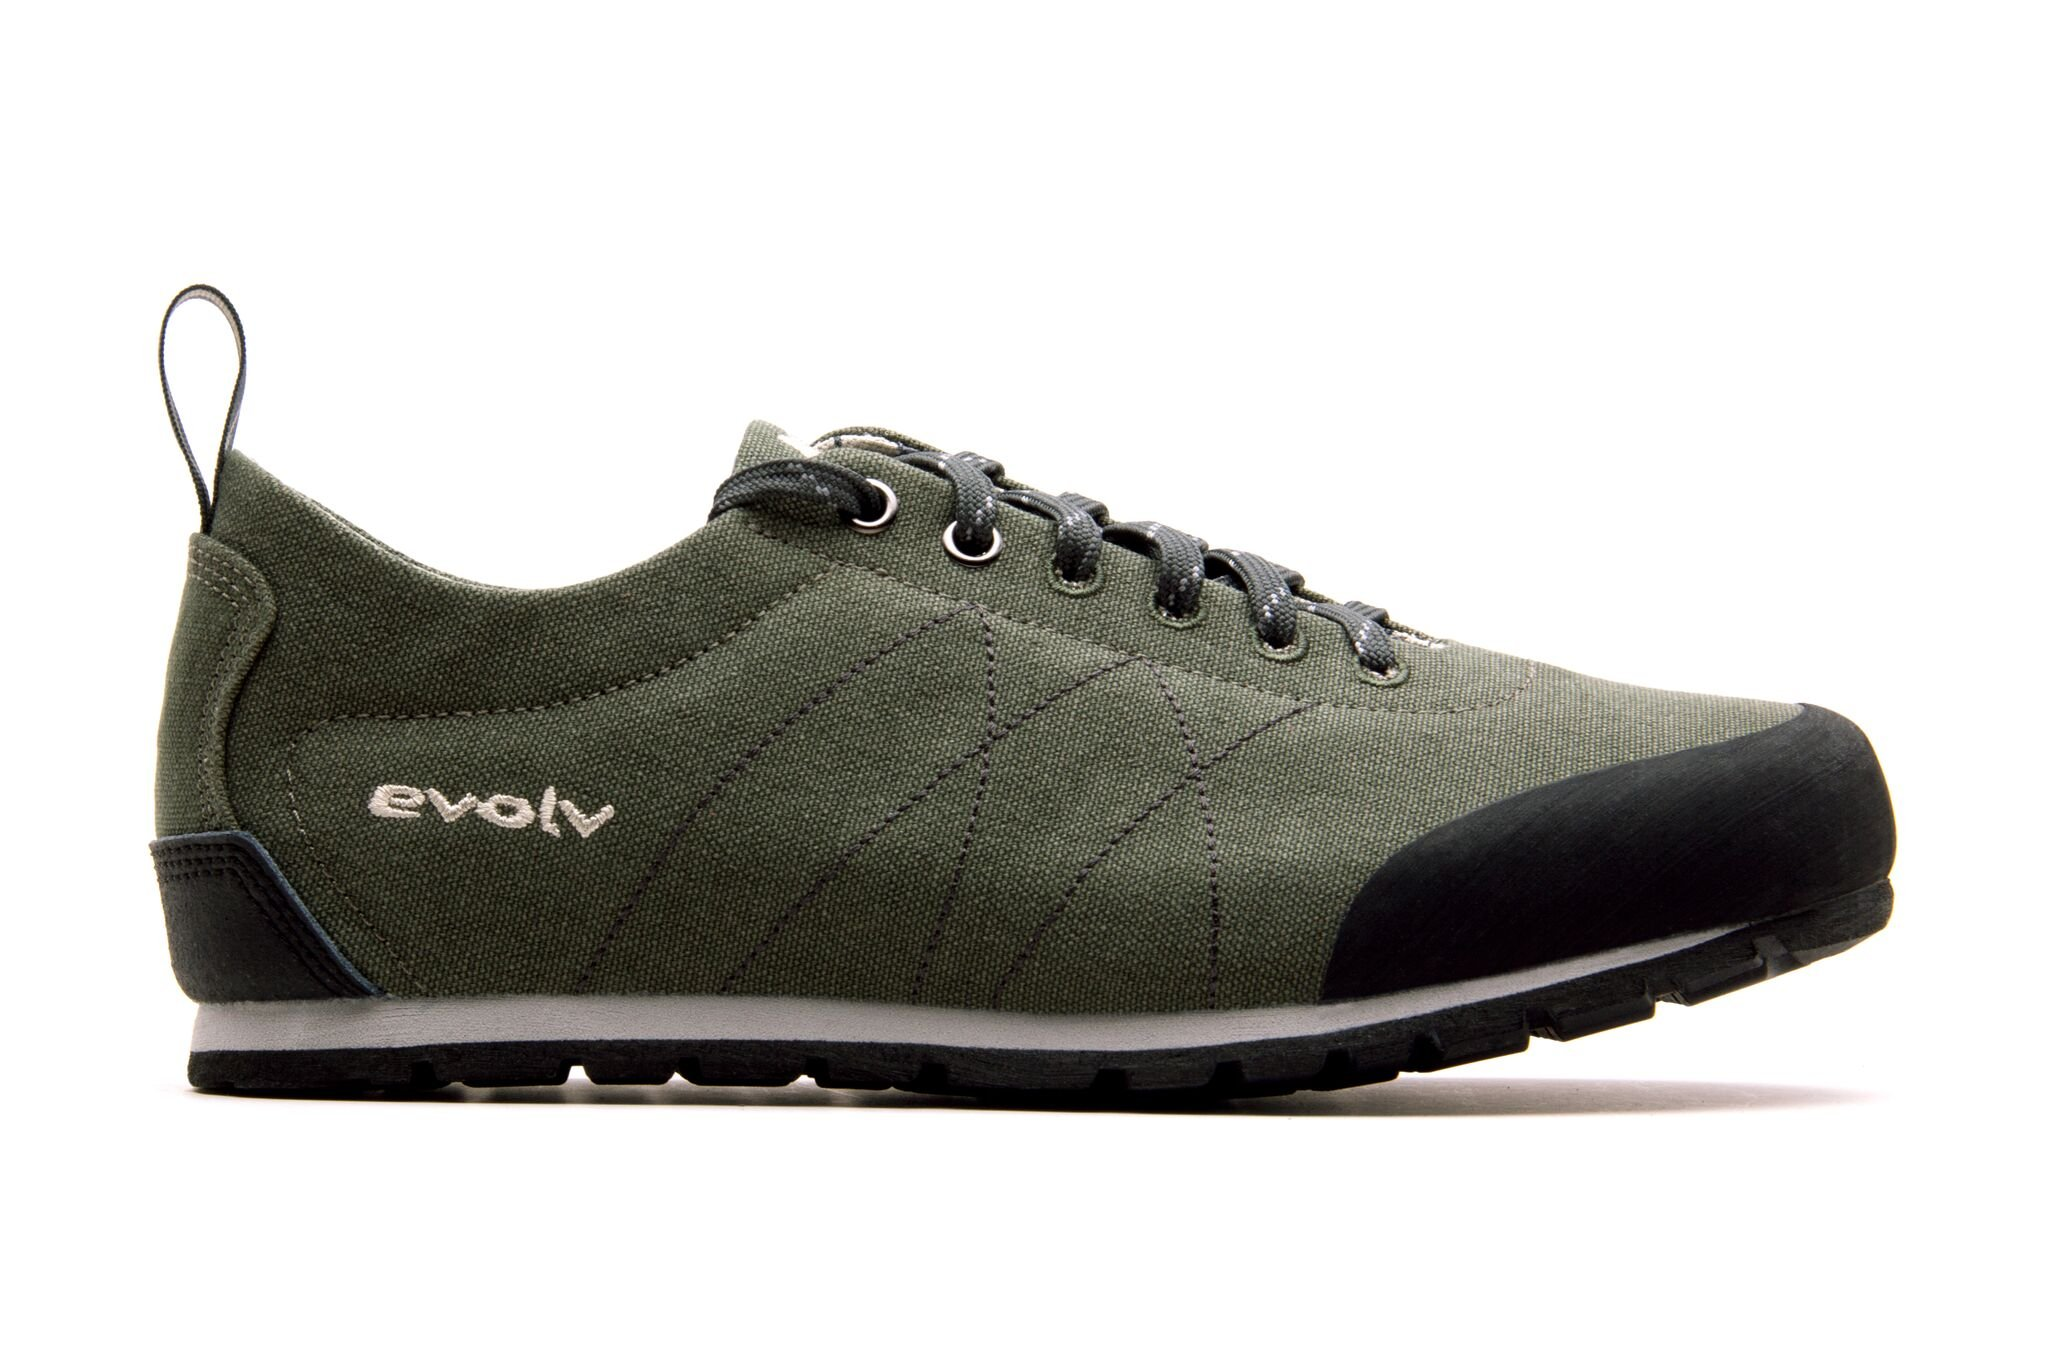 Evolv Cruzer Psyche Women's Performance Lifestyle Shoe; Size: 6 B(M) US - Olive Night